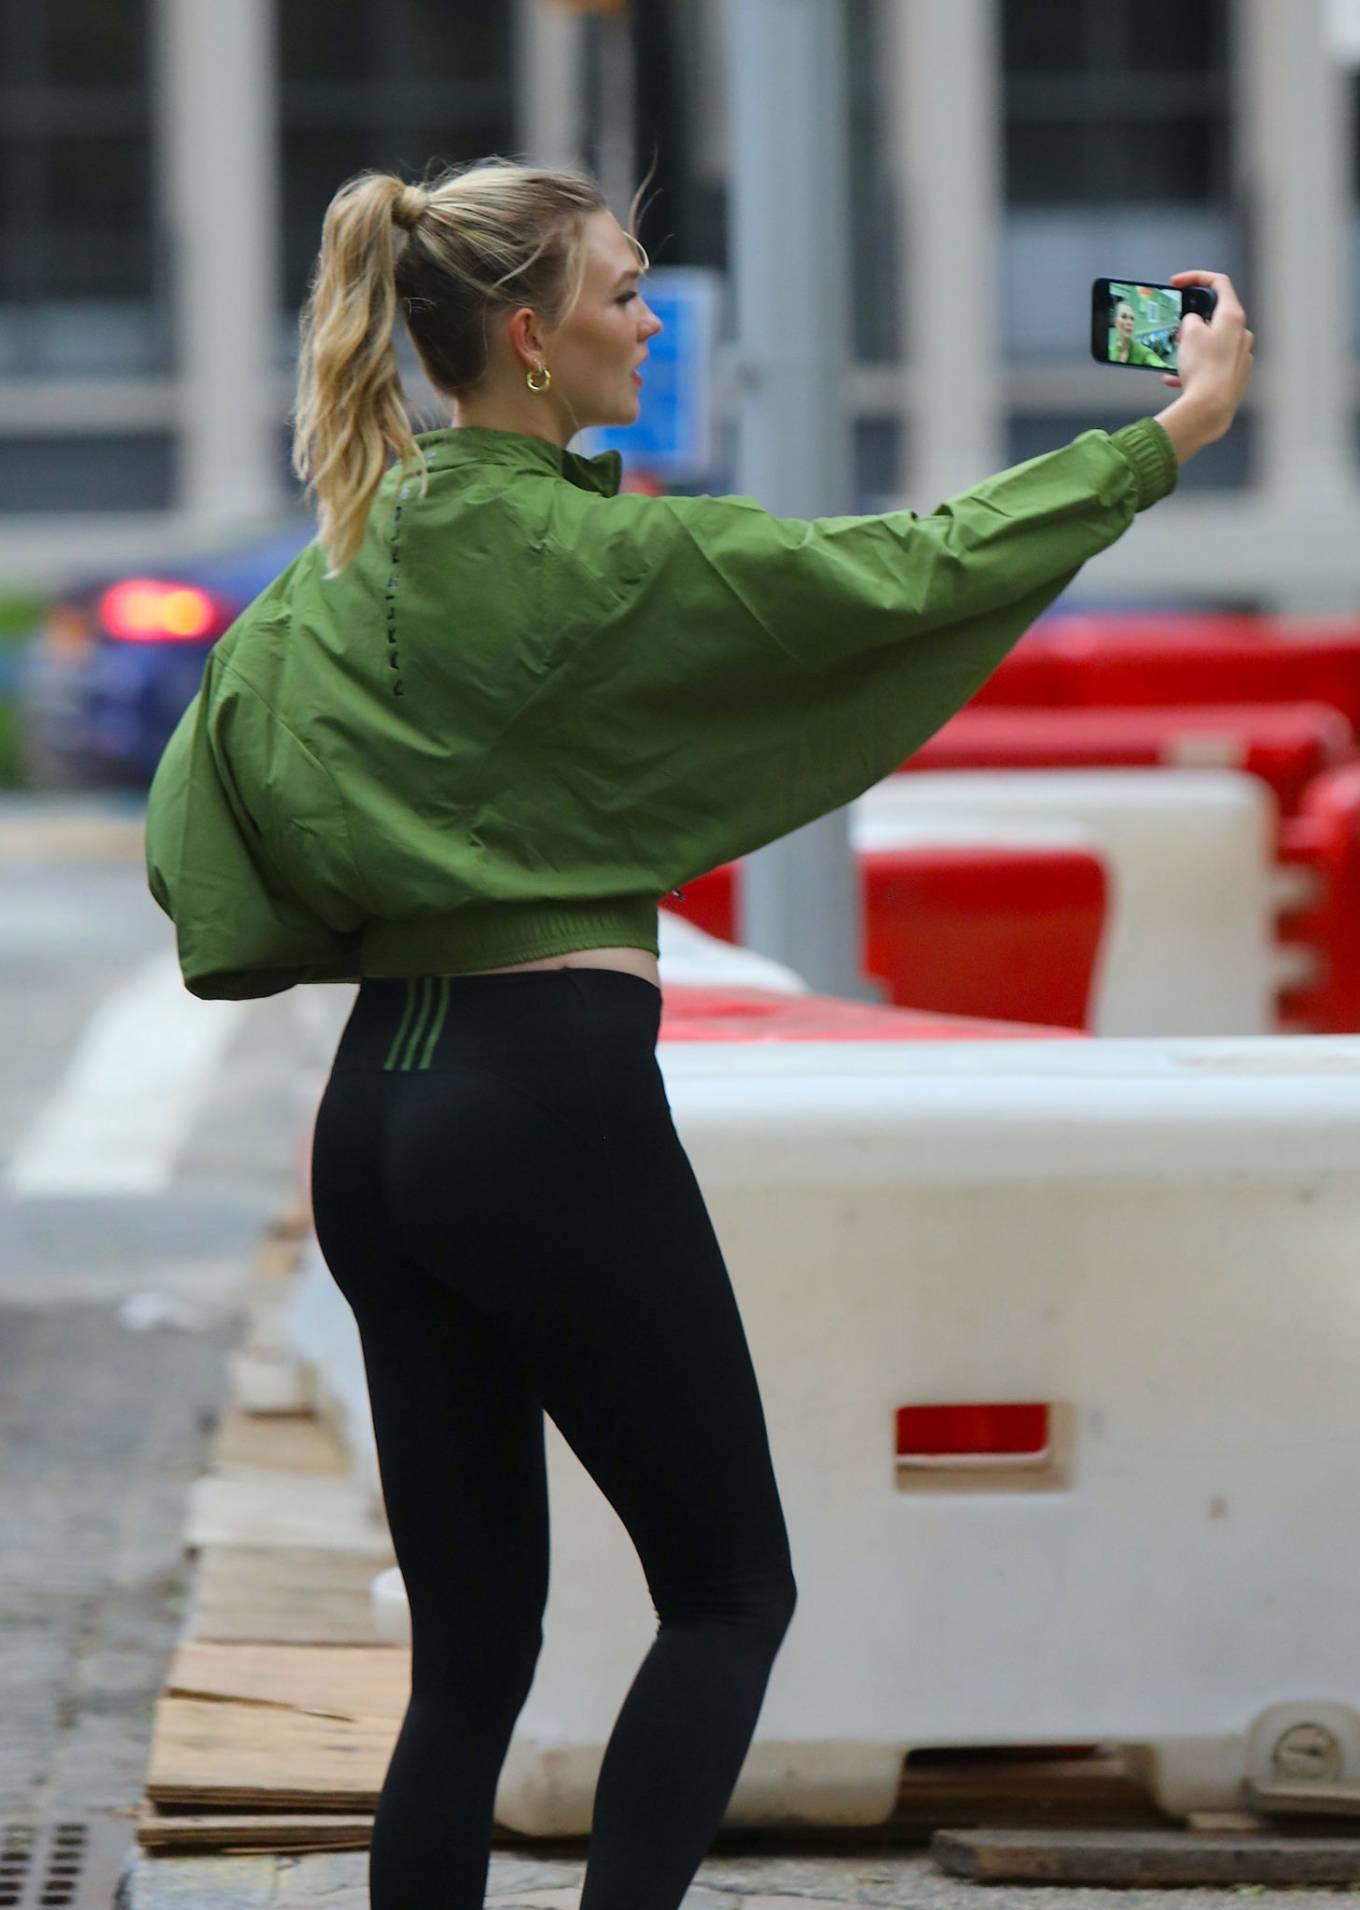 Karlie Kloss - Photoshoot for 'Karlie Kloss x Adidas' in New York